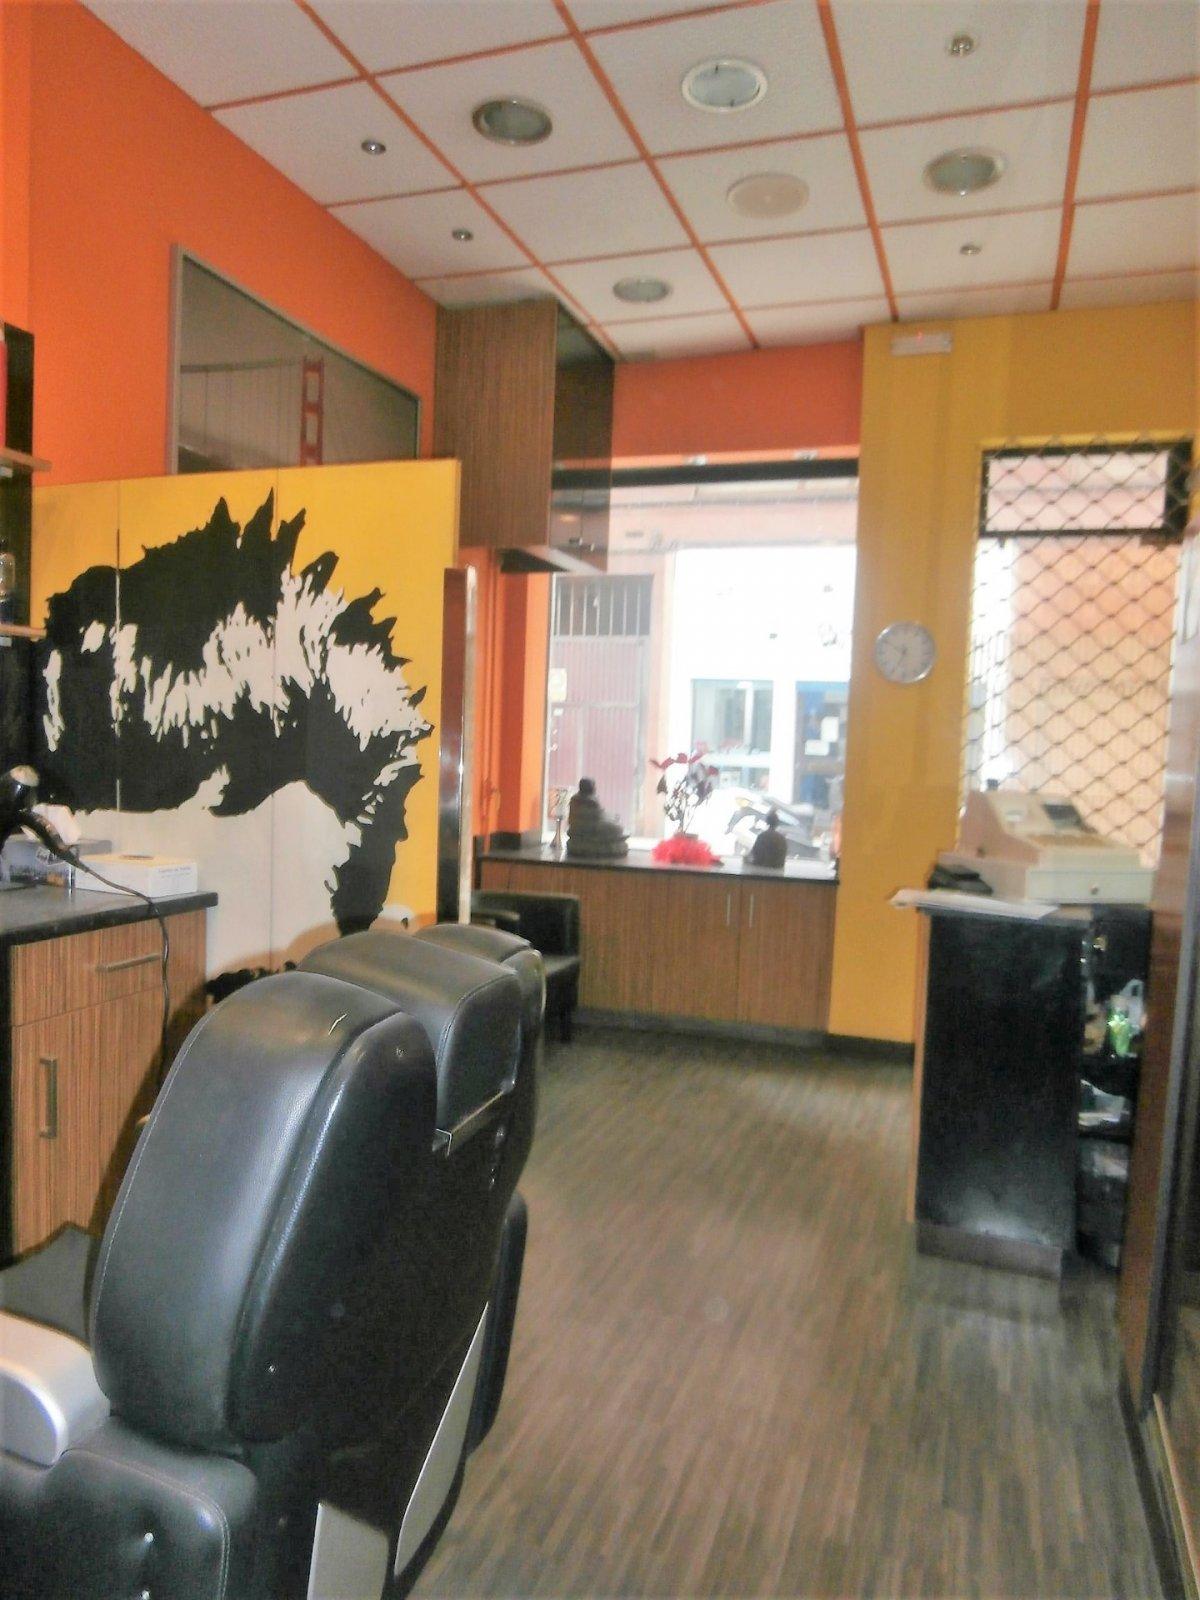 Local instalado como peluqueria - imagenInmueble6